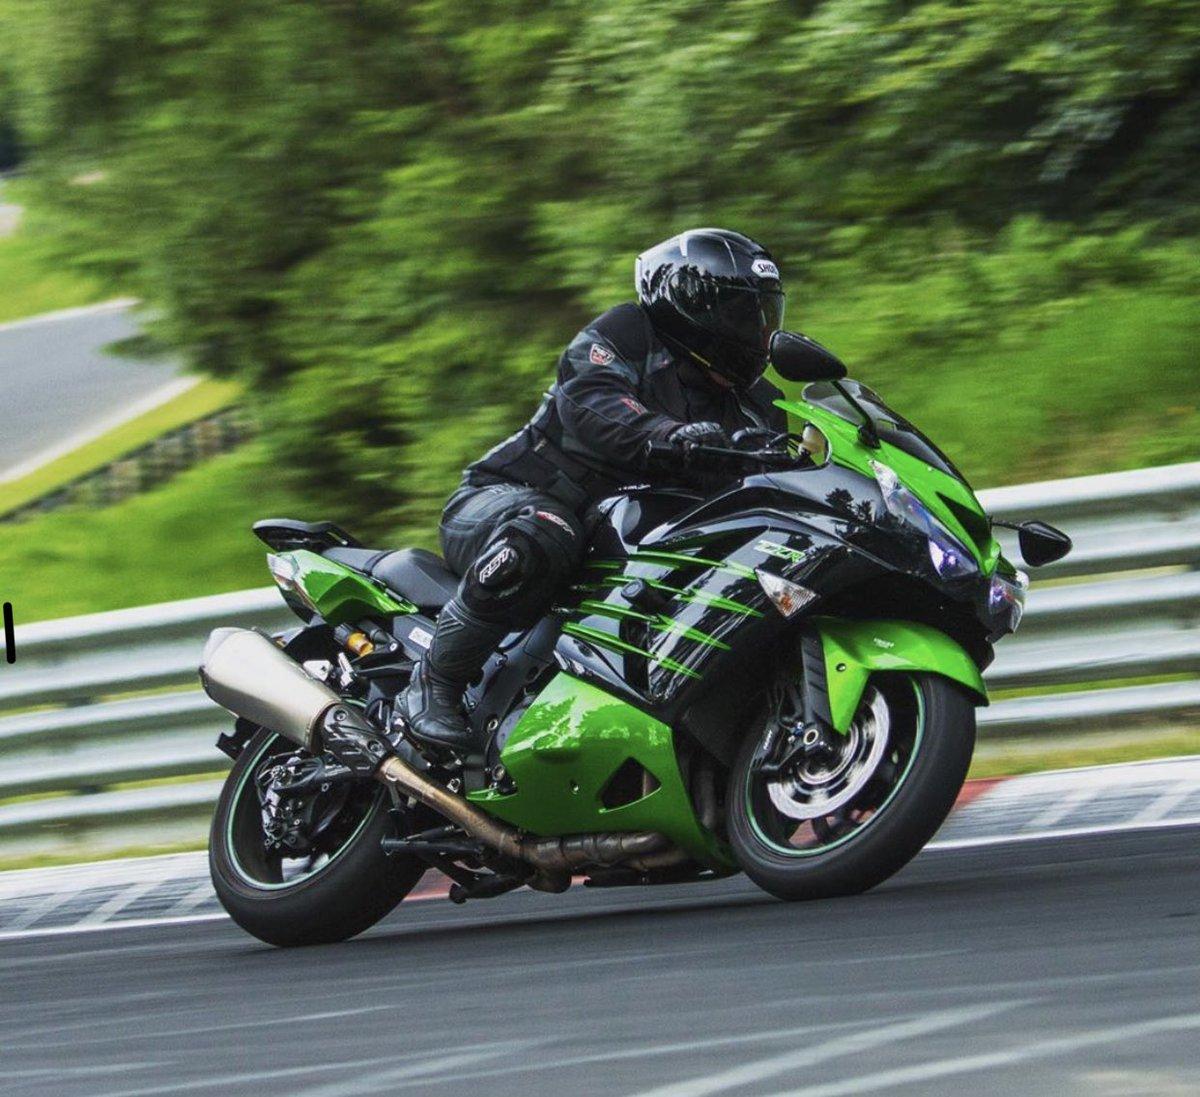 Тест-драйв мотоцикла Kawasaki ZZR1400 (ZX14R)